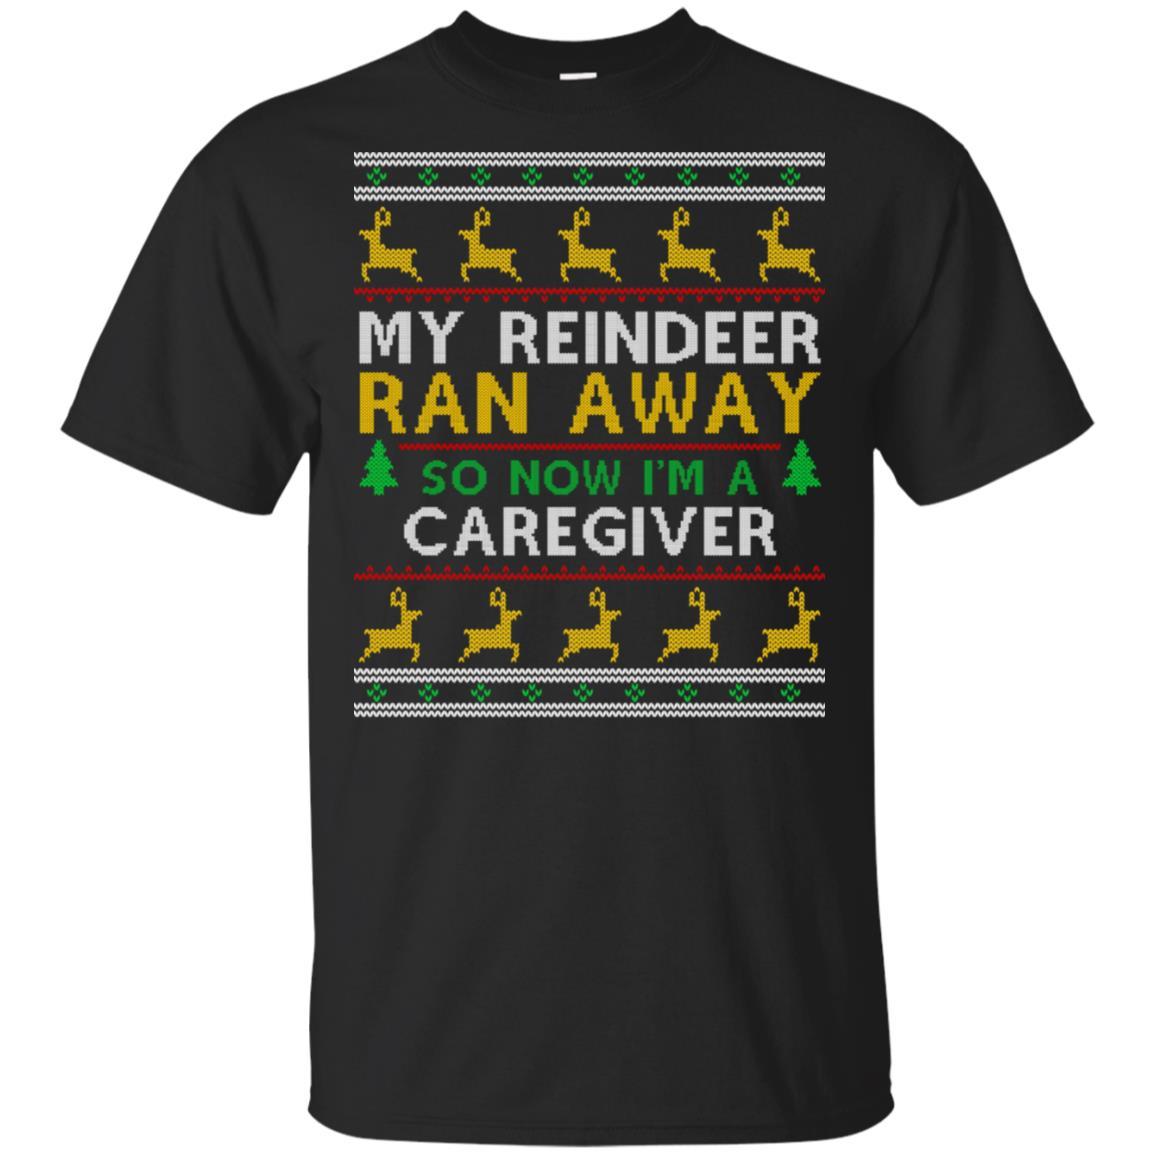 My Reindeer Ran Away I'm A Caregiver Unisex Short Sleeve